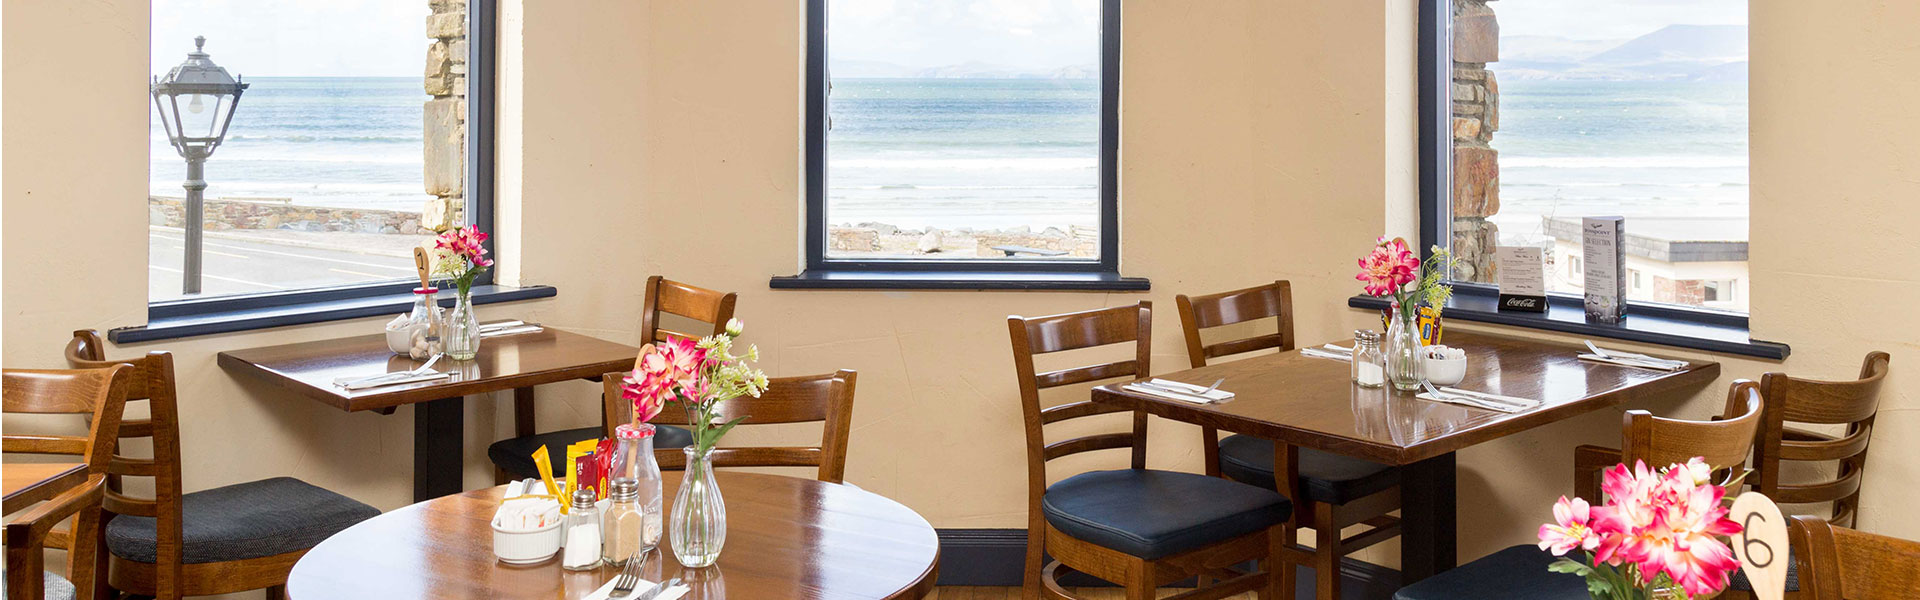 Rosspoint Restaurant Rossbeigh Restaurant with Beach Views